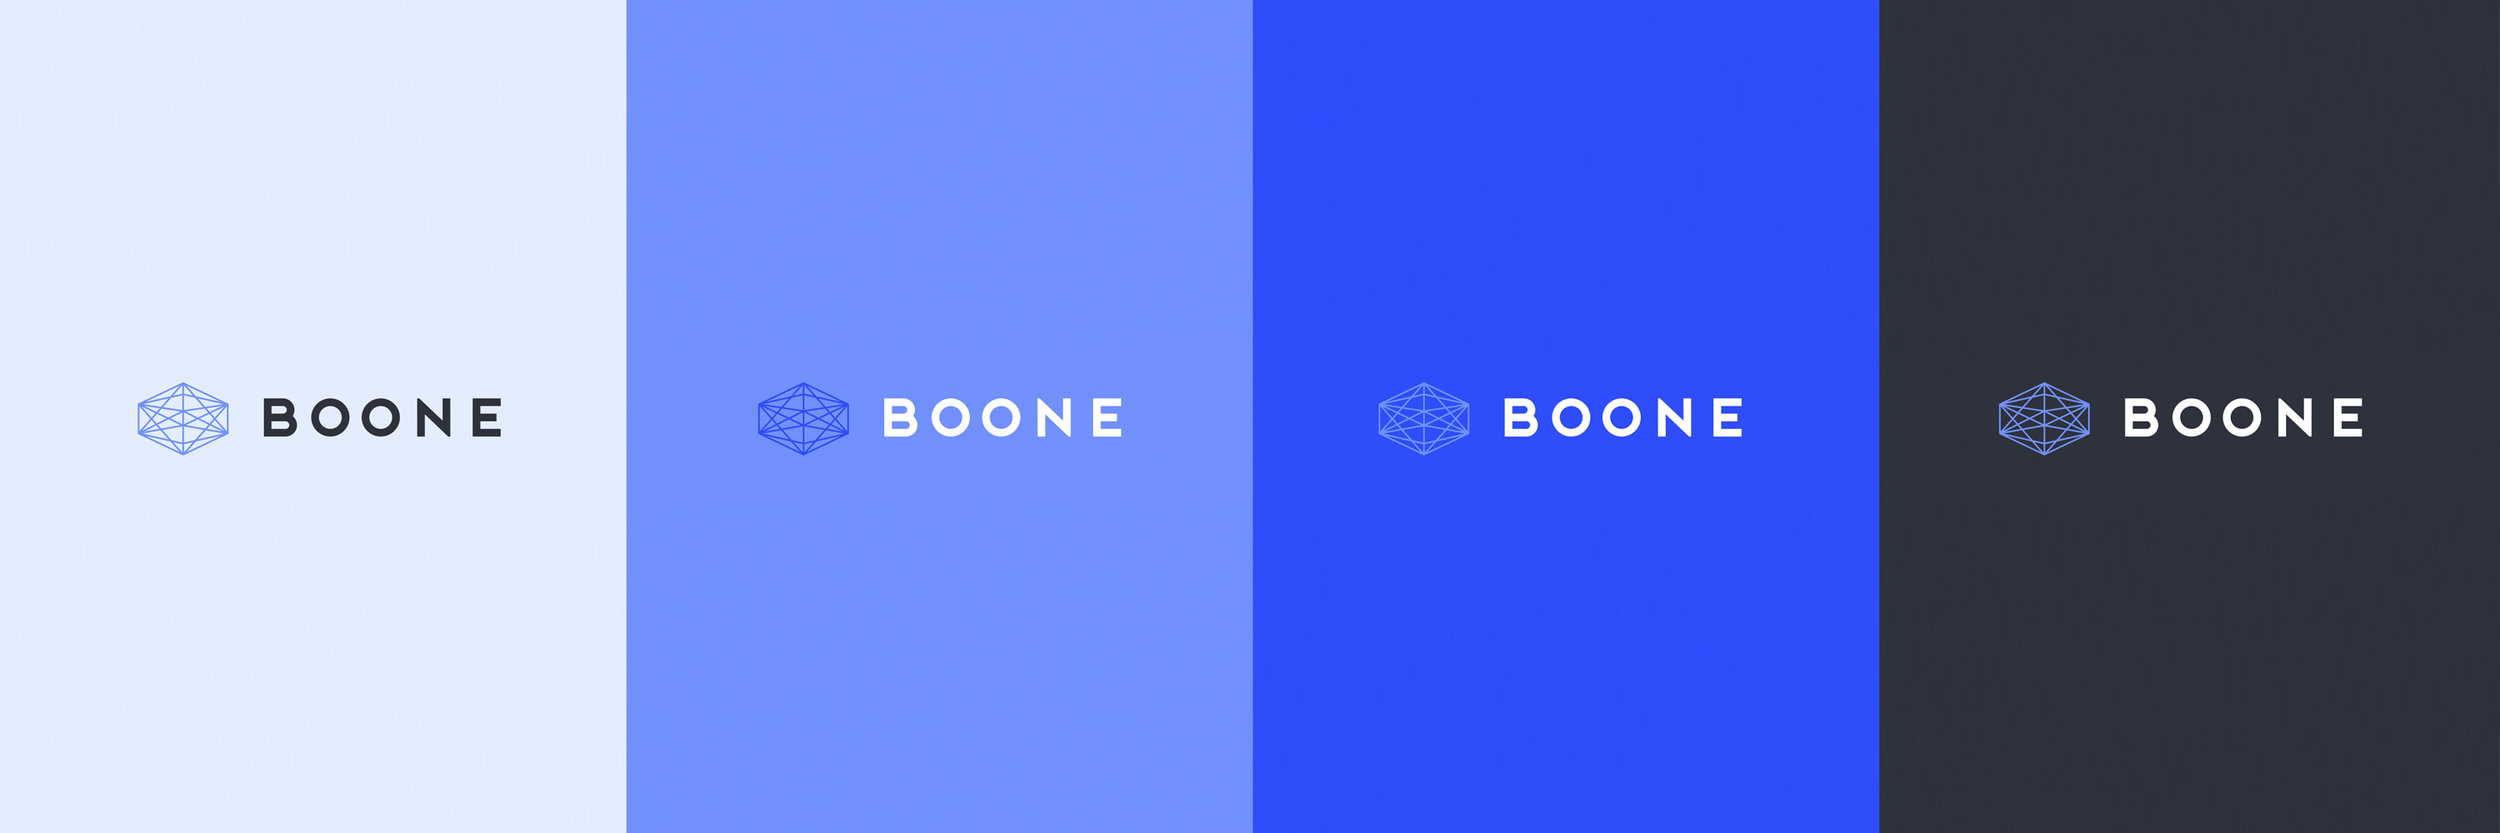 WBCG_Boone_color-variations.jpg